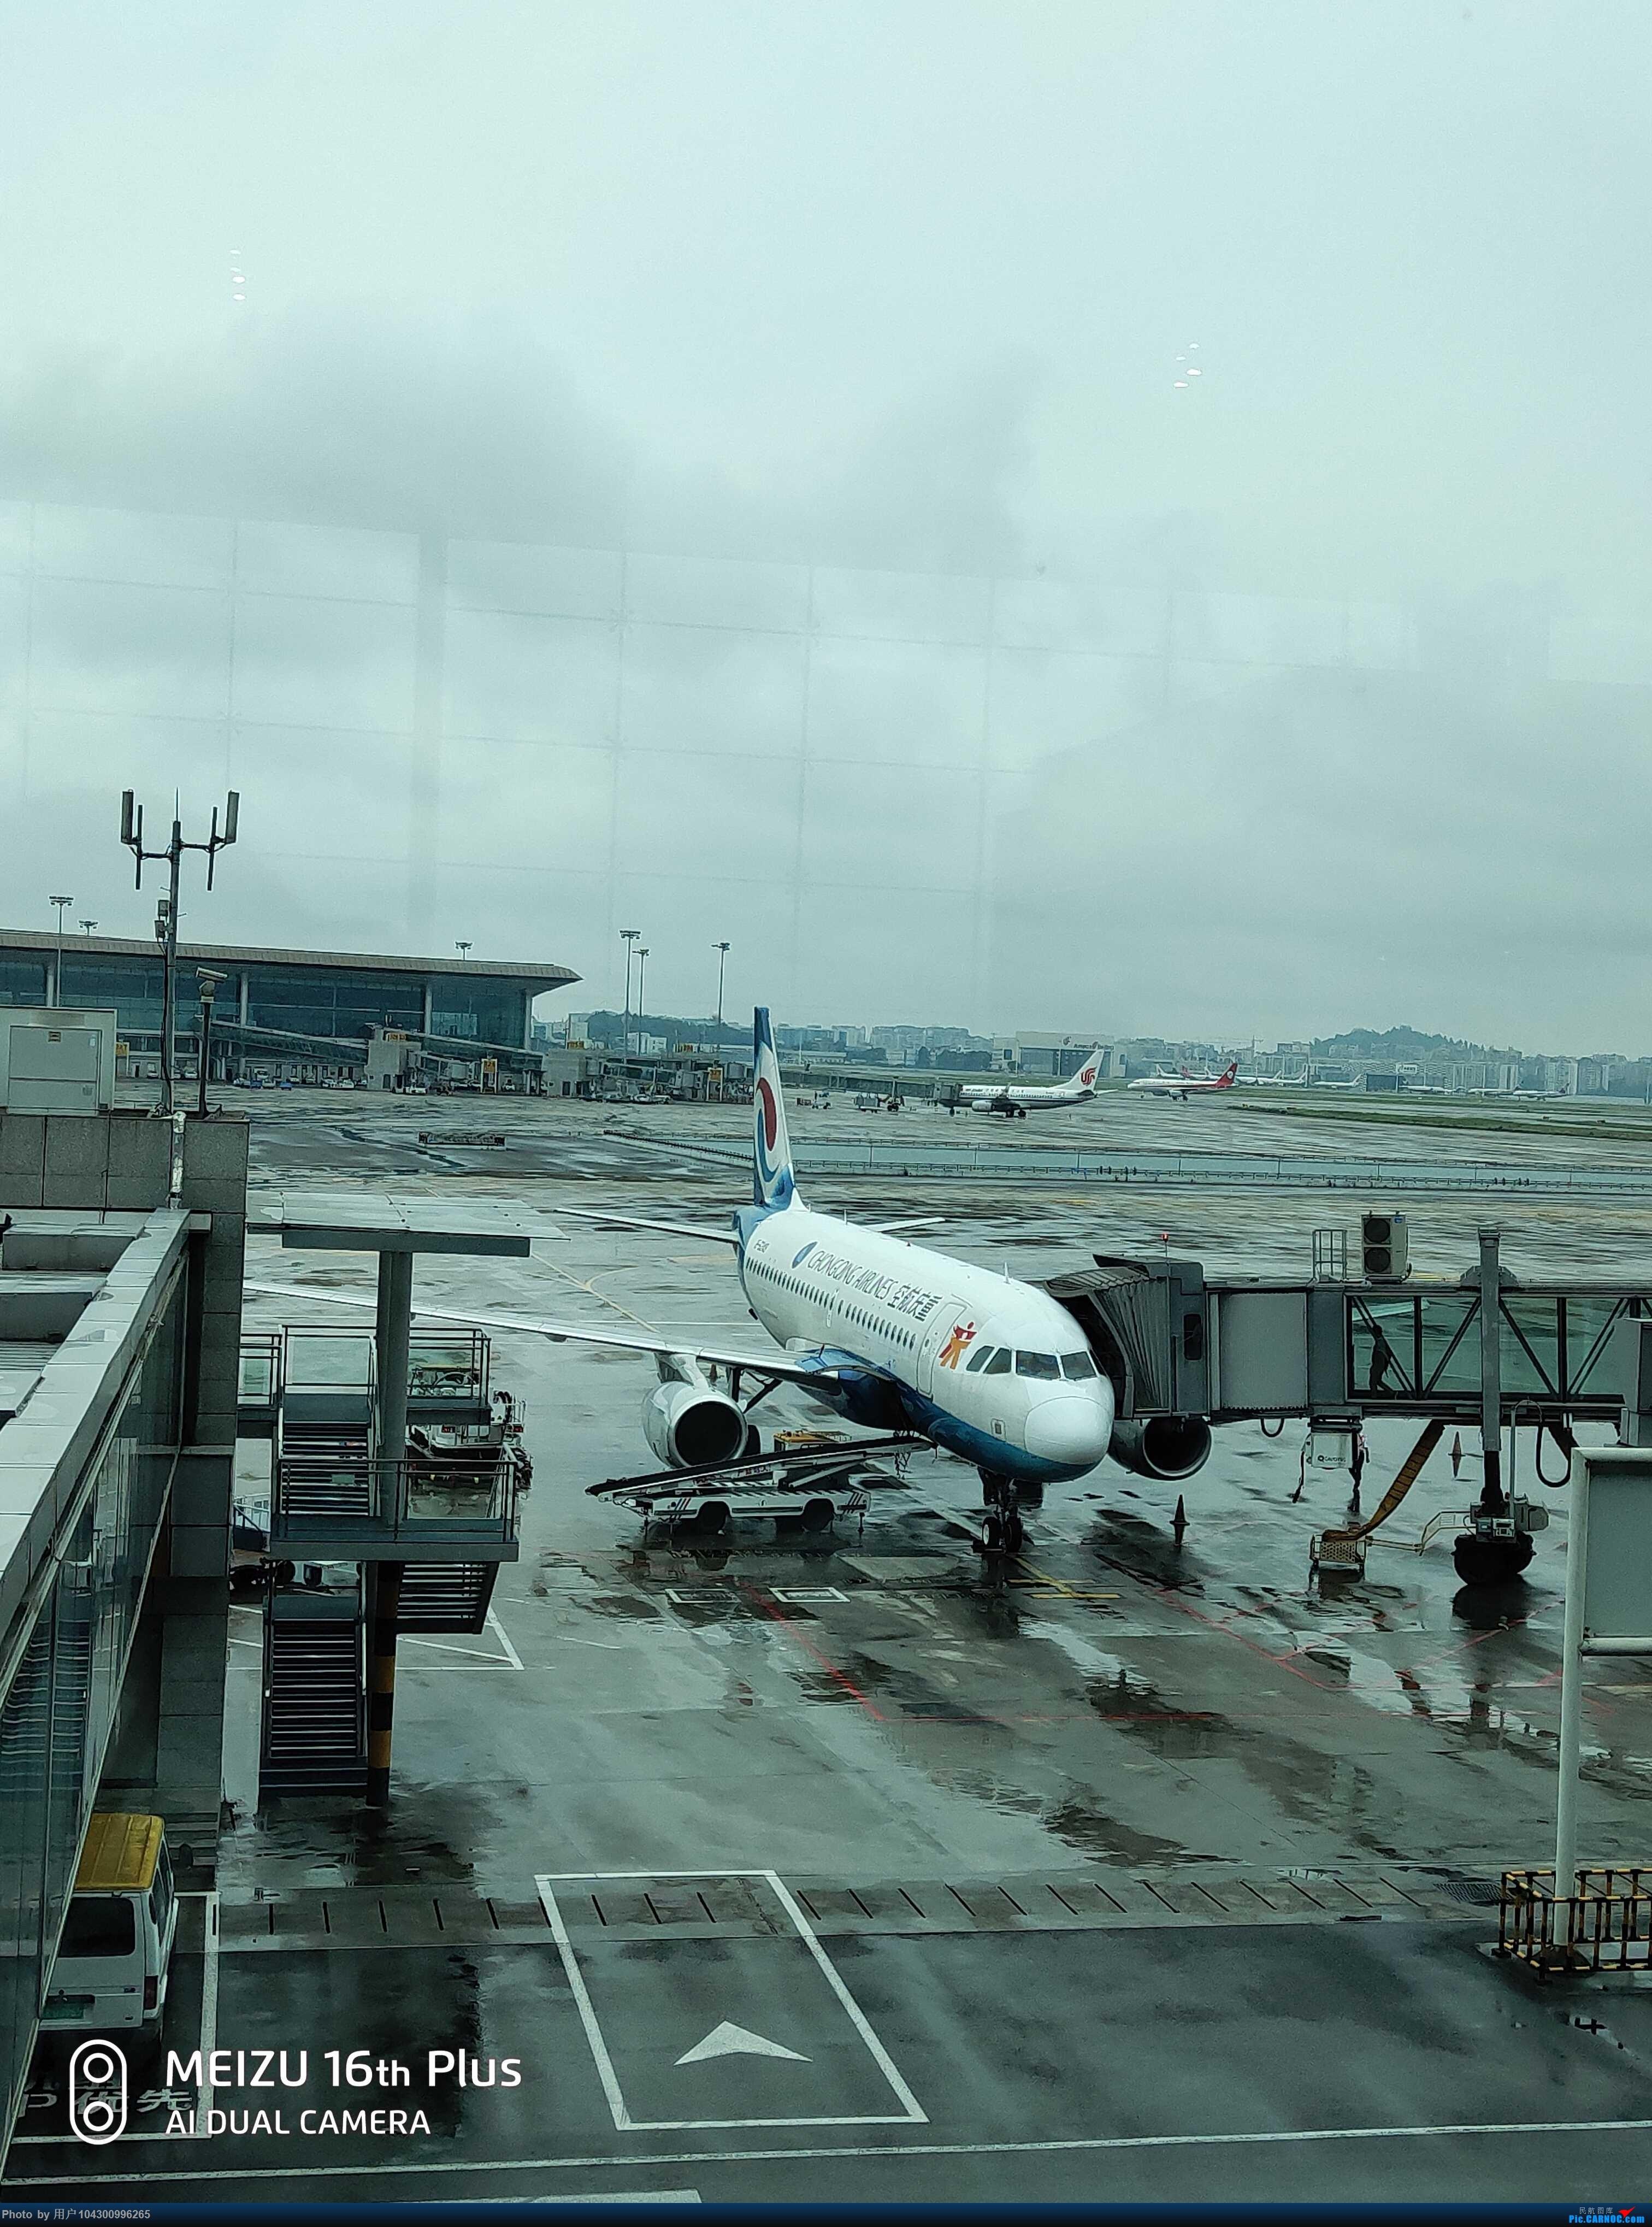 Re:[原创]〖DM哥游记〗多彩贵州航空~重庆--贵阳 AIRBUS A319-100 B-6248 中国重庆江北国际机场